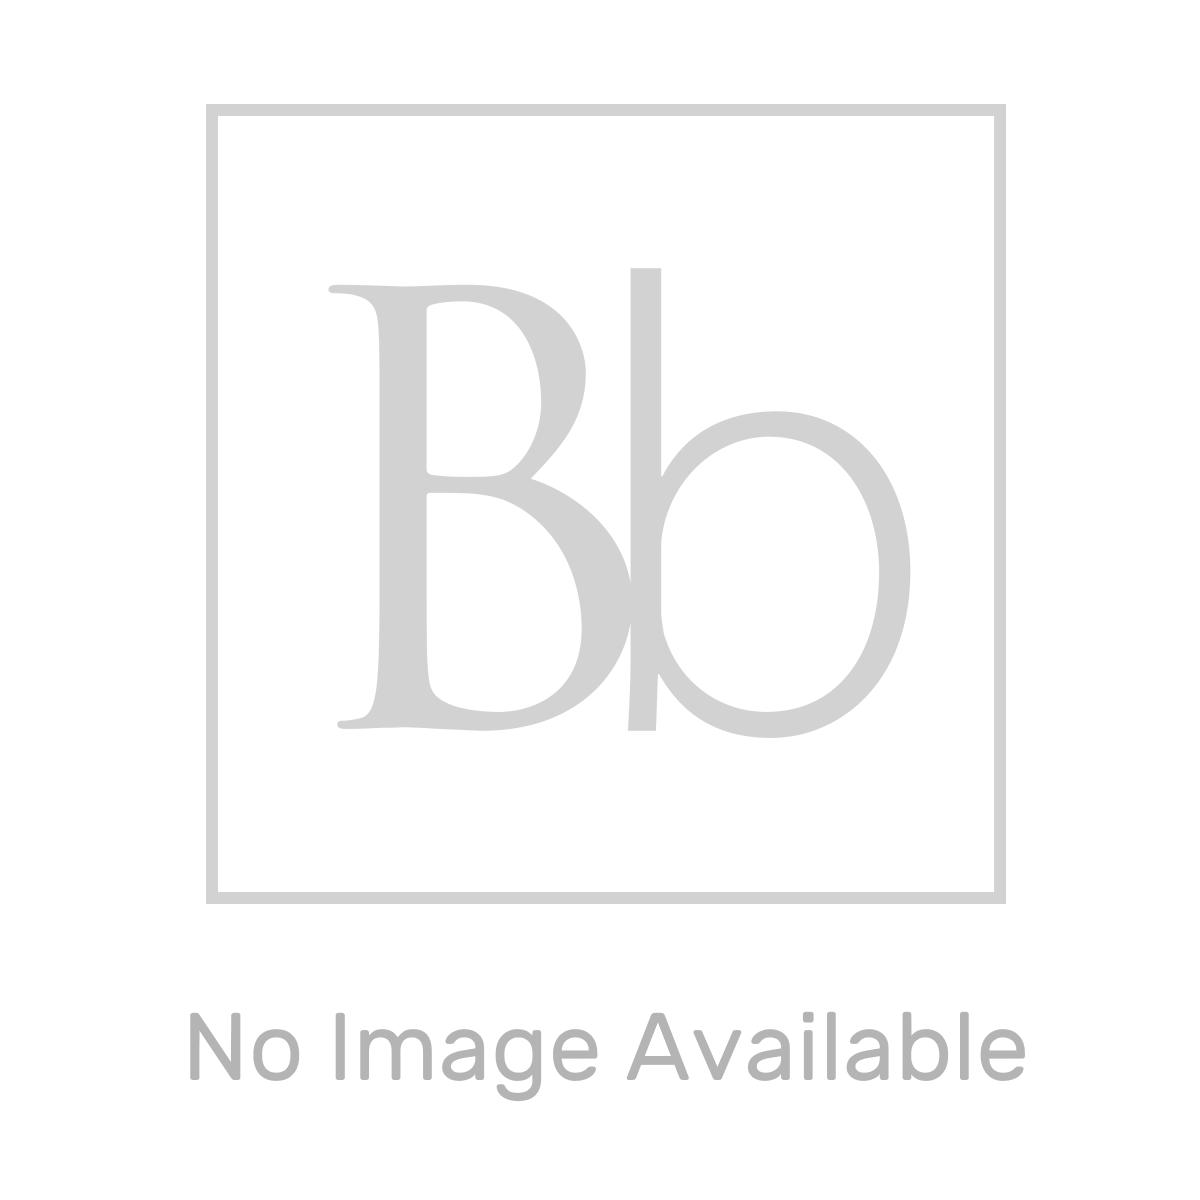 Elation Eko Graphite Gloss WC Unit 550mm